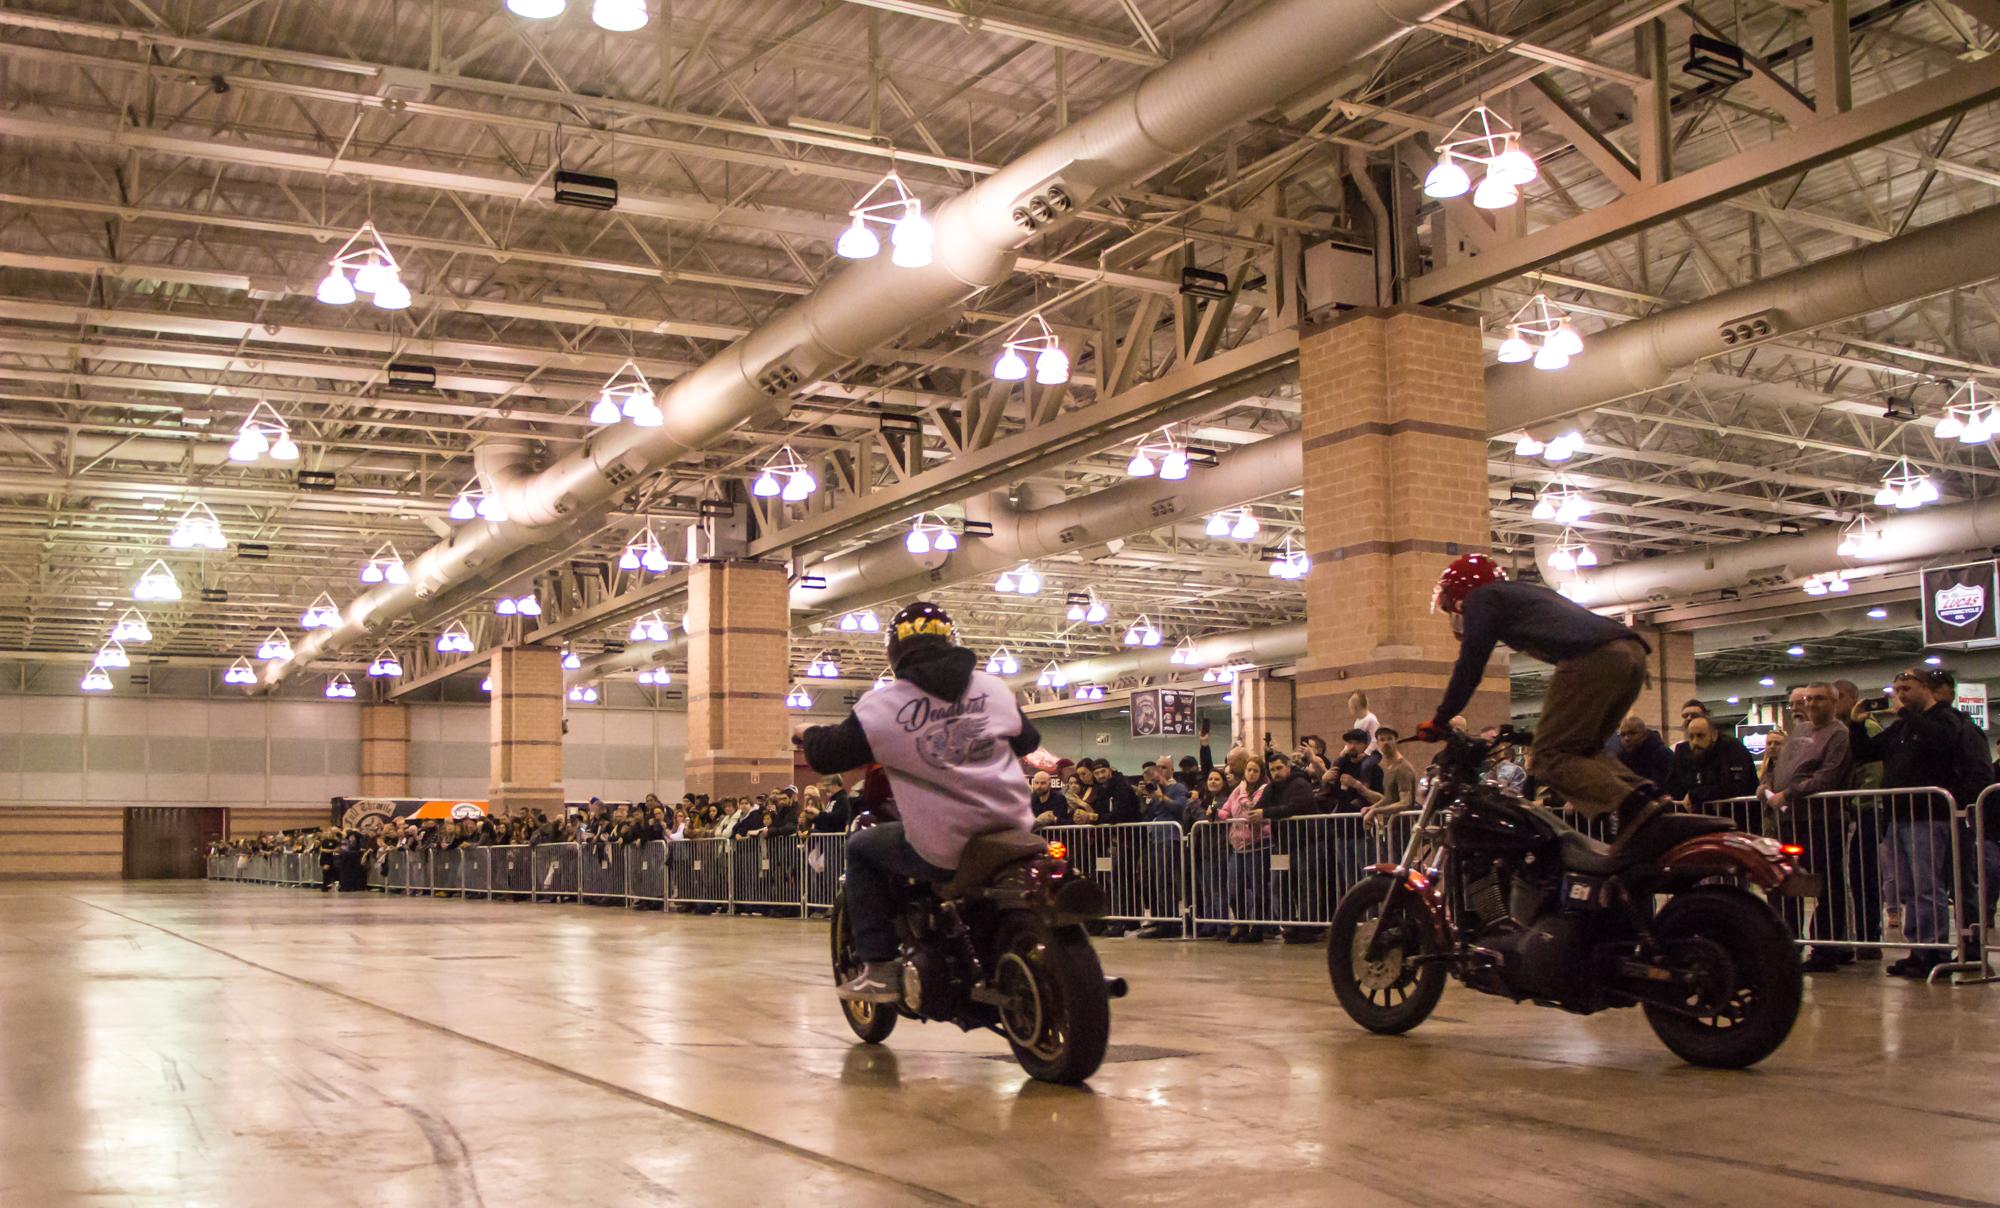 Easyriders Show Atlantic City NJ Deadbeat Customs Blog - Car show atlantic city 2018